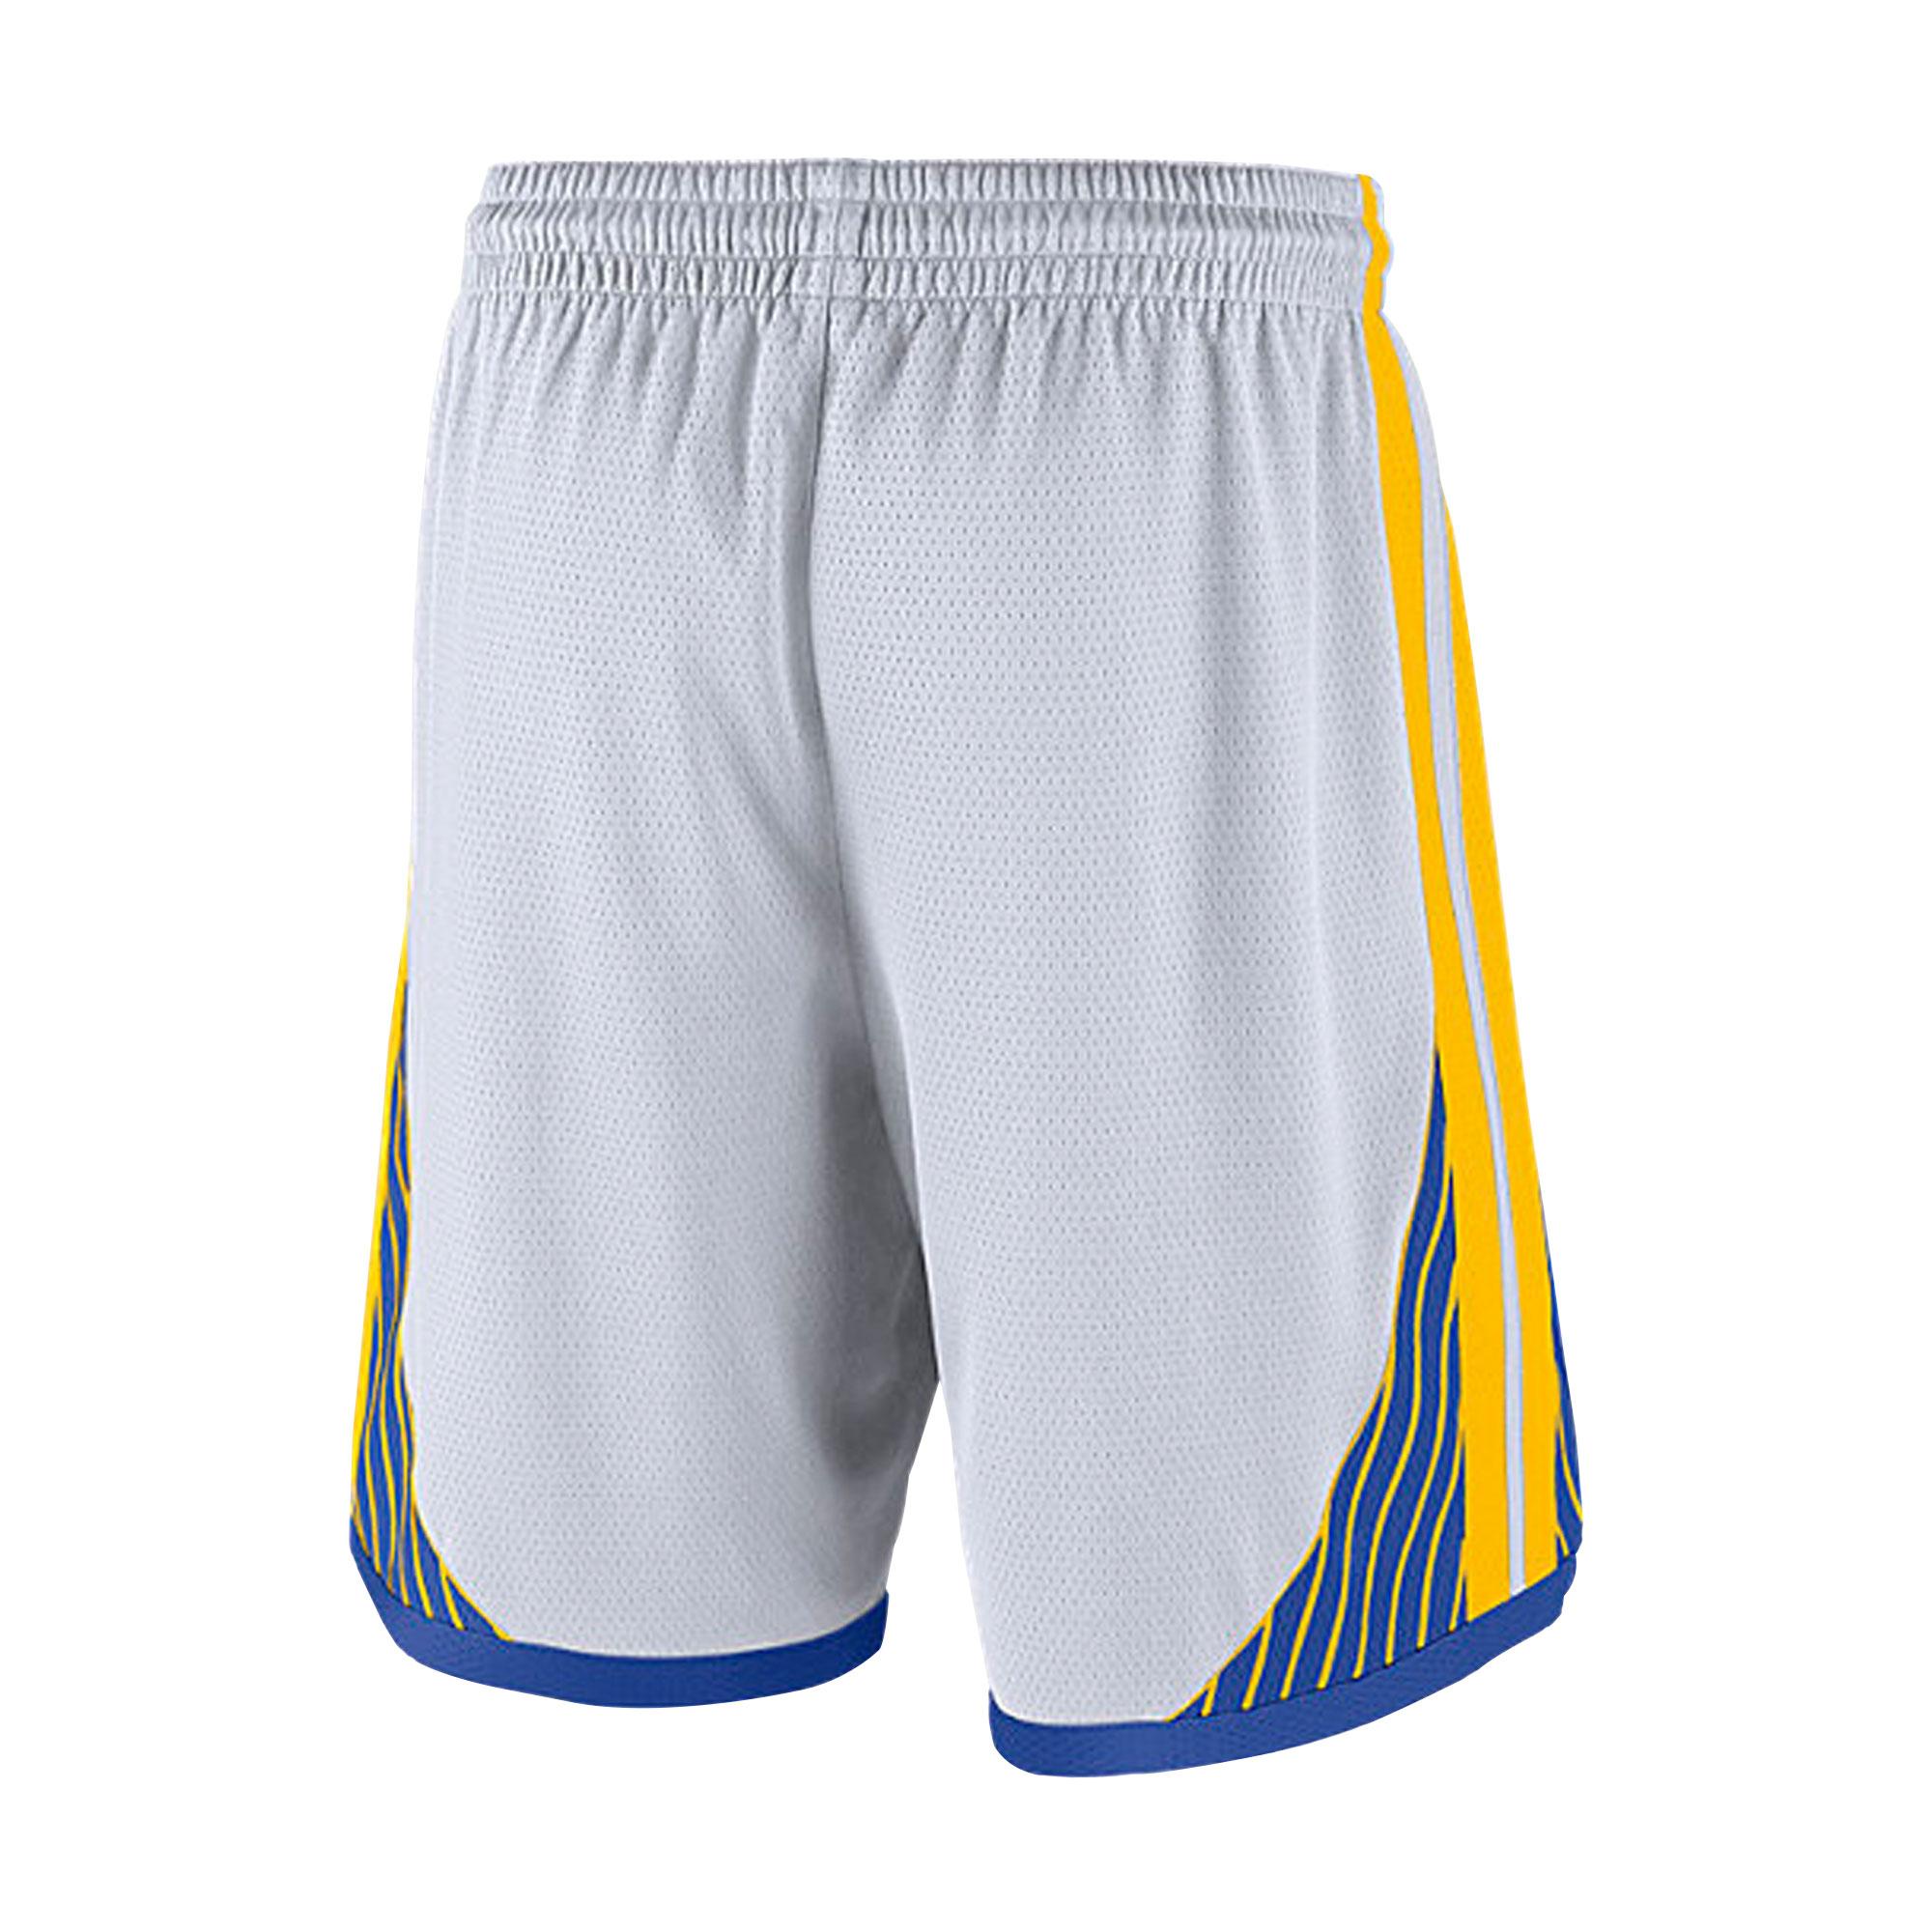 Golden State Warriors Short (SRT-GRY-GSW)